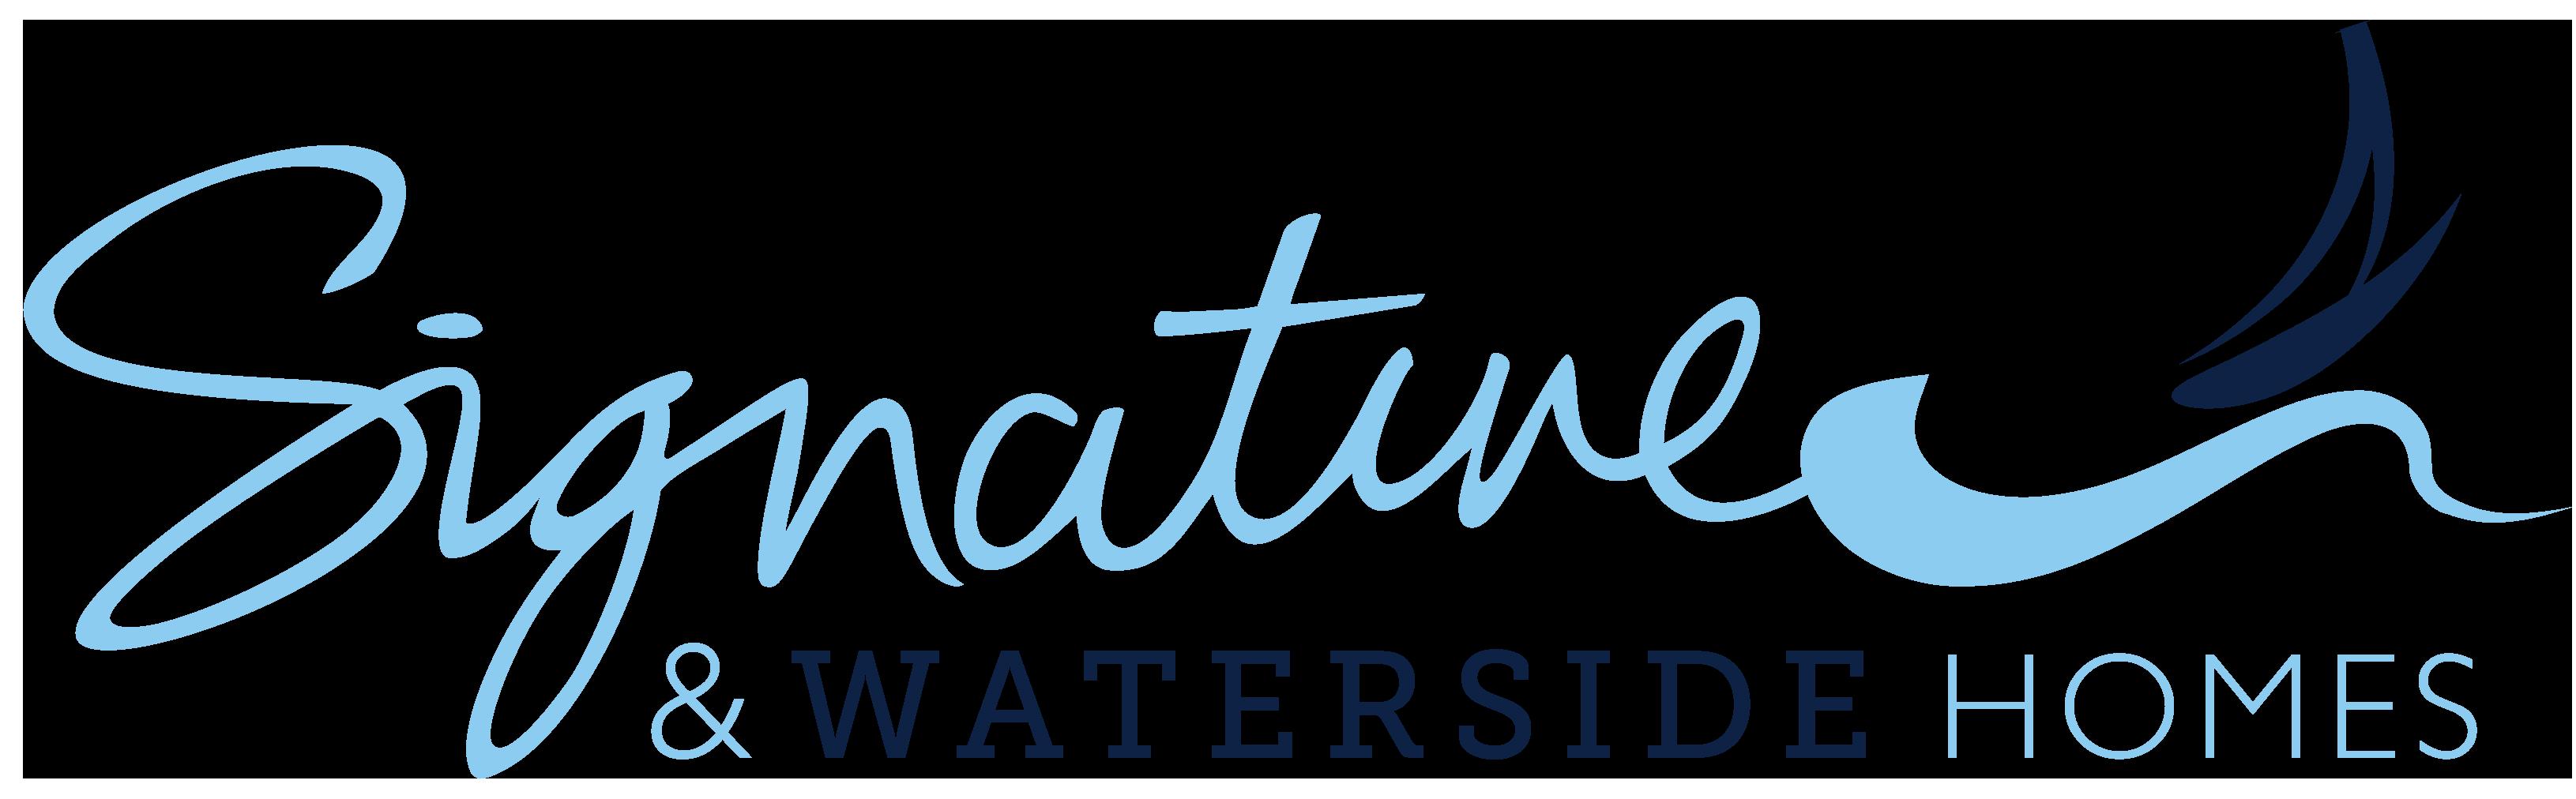 sigwater-logo1